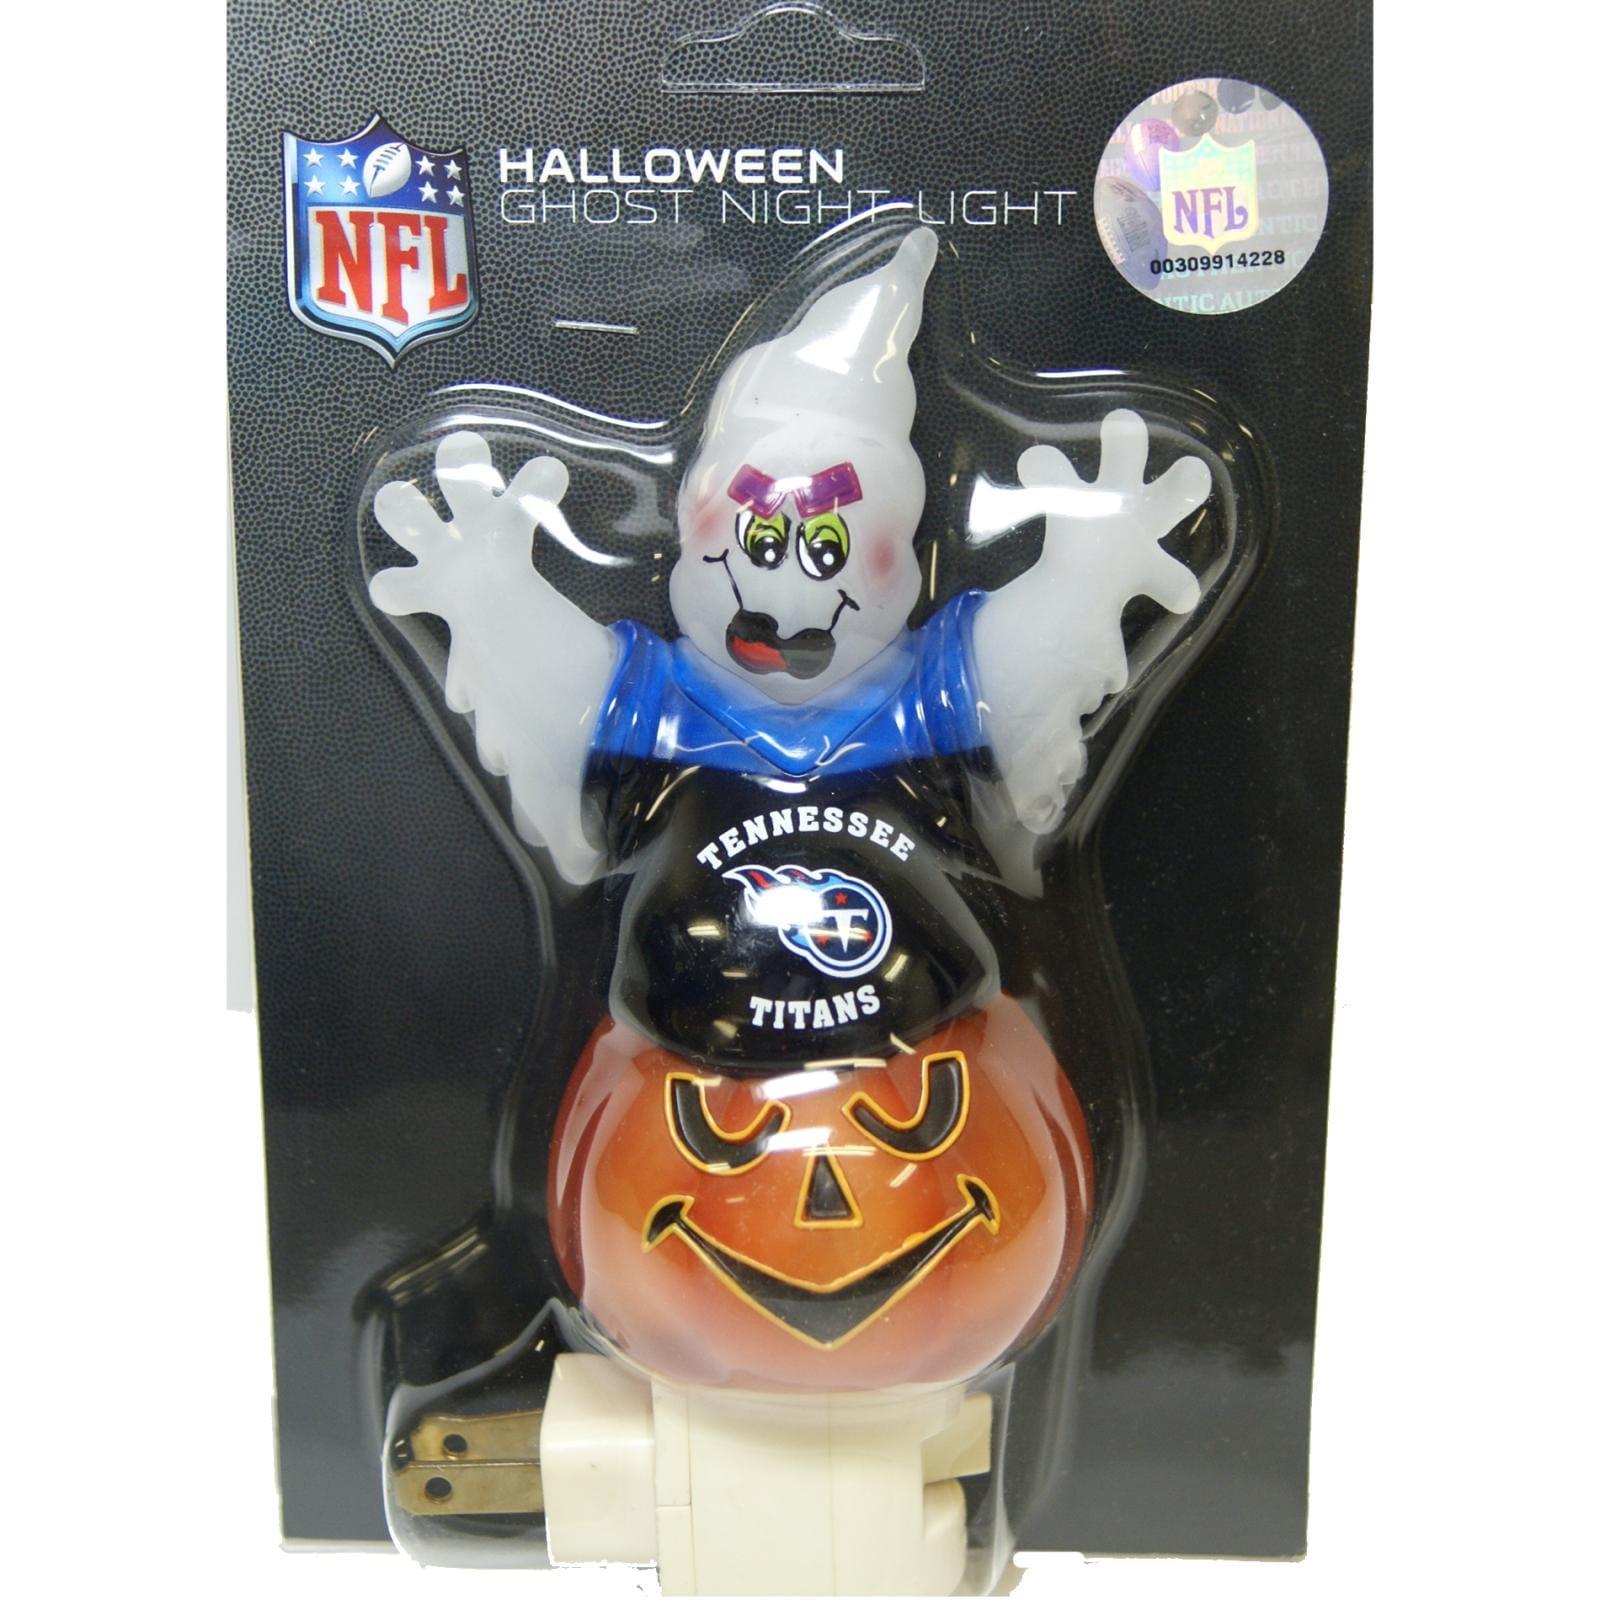 Tennessee Titans Halloween Ghost Night Light